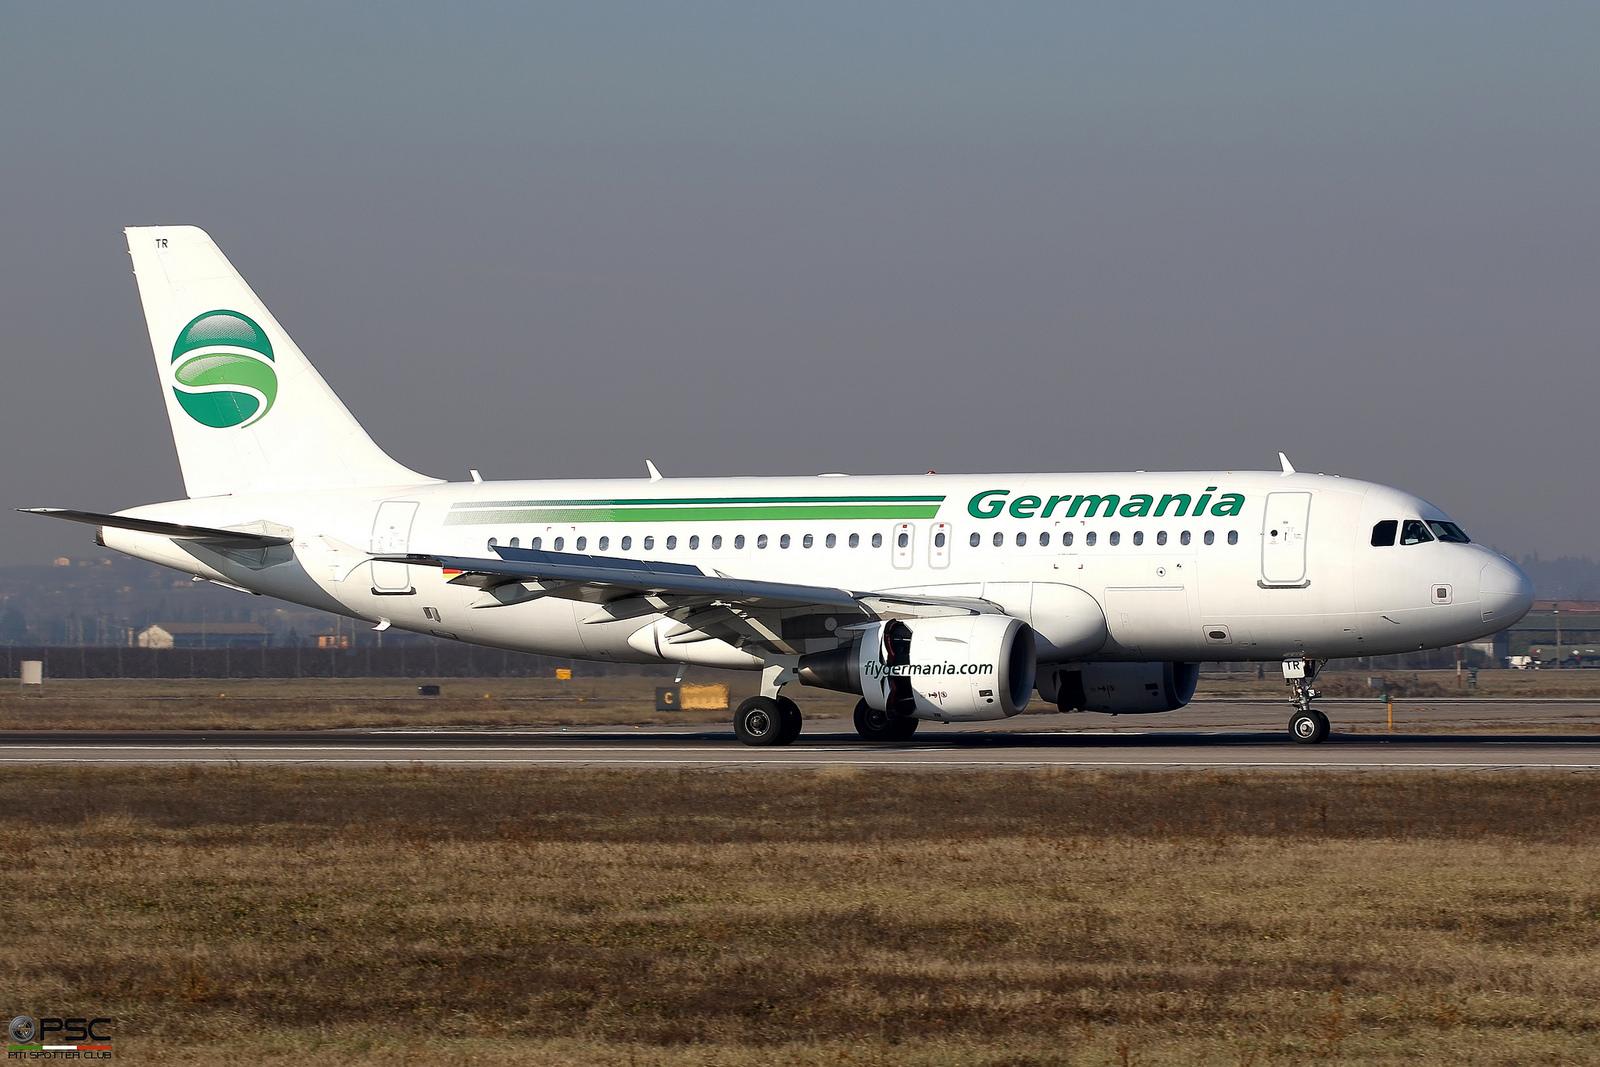 D-ASTR A319-111 3950 Germania @ Aeroporto di Verona - 31.12.2016  © Piti Spotter Club Verona